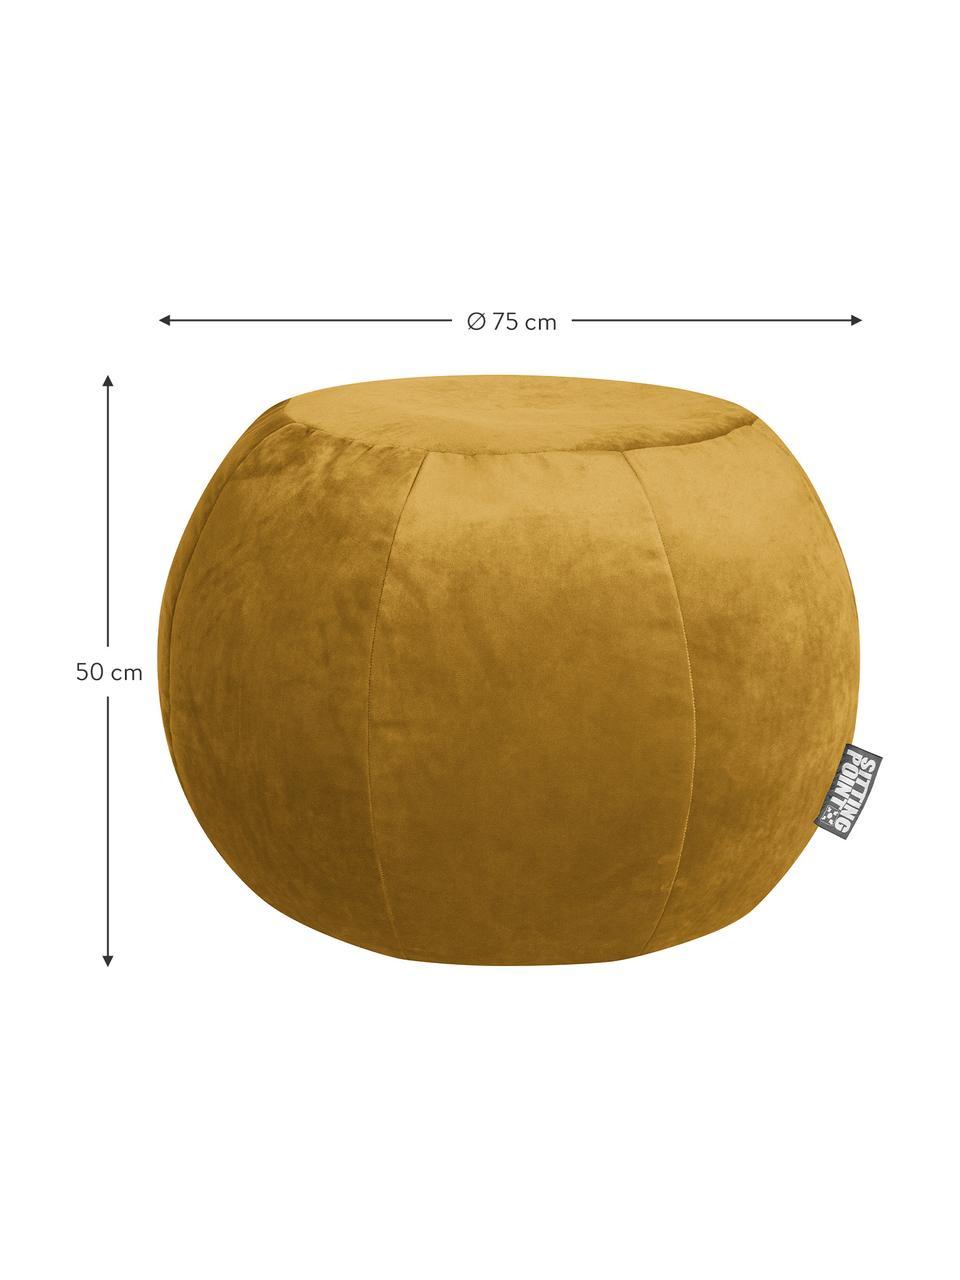 Samt-Pouf Plump Veluto, Bezug: Polyestersamt, Senfgelb, Ø 75 x H 50 cm